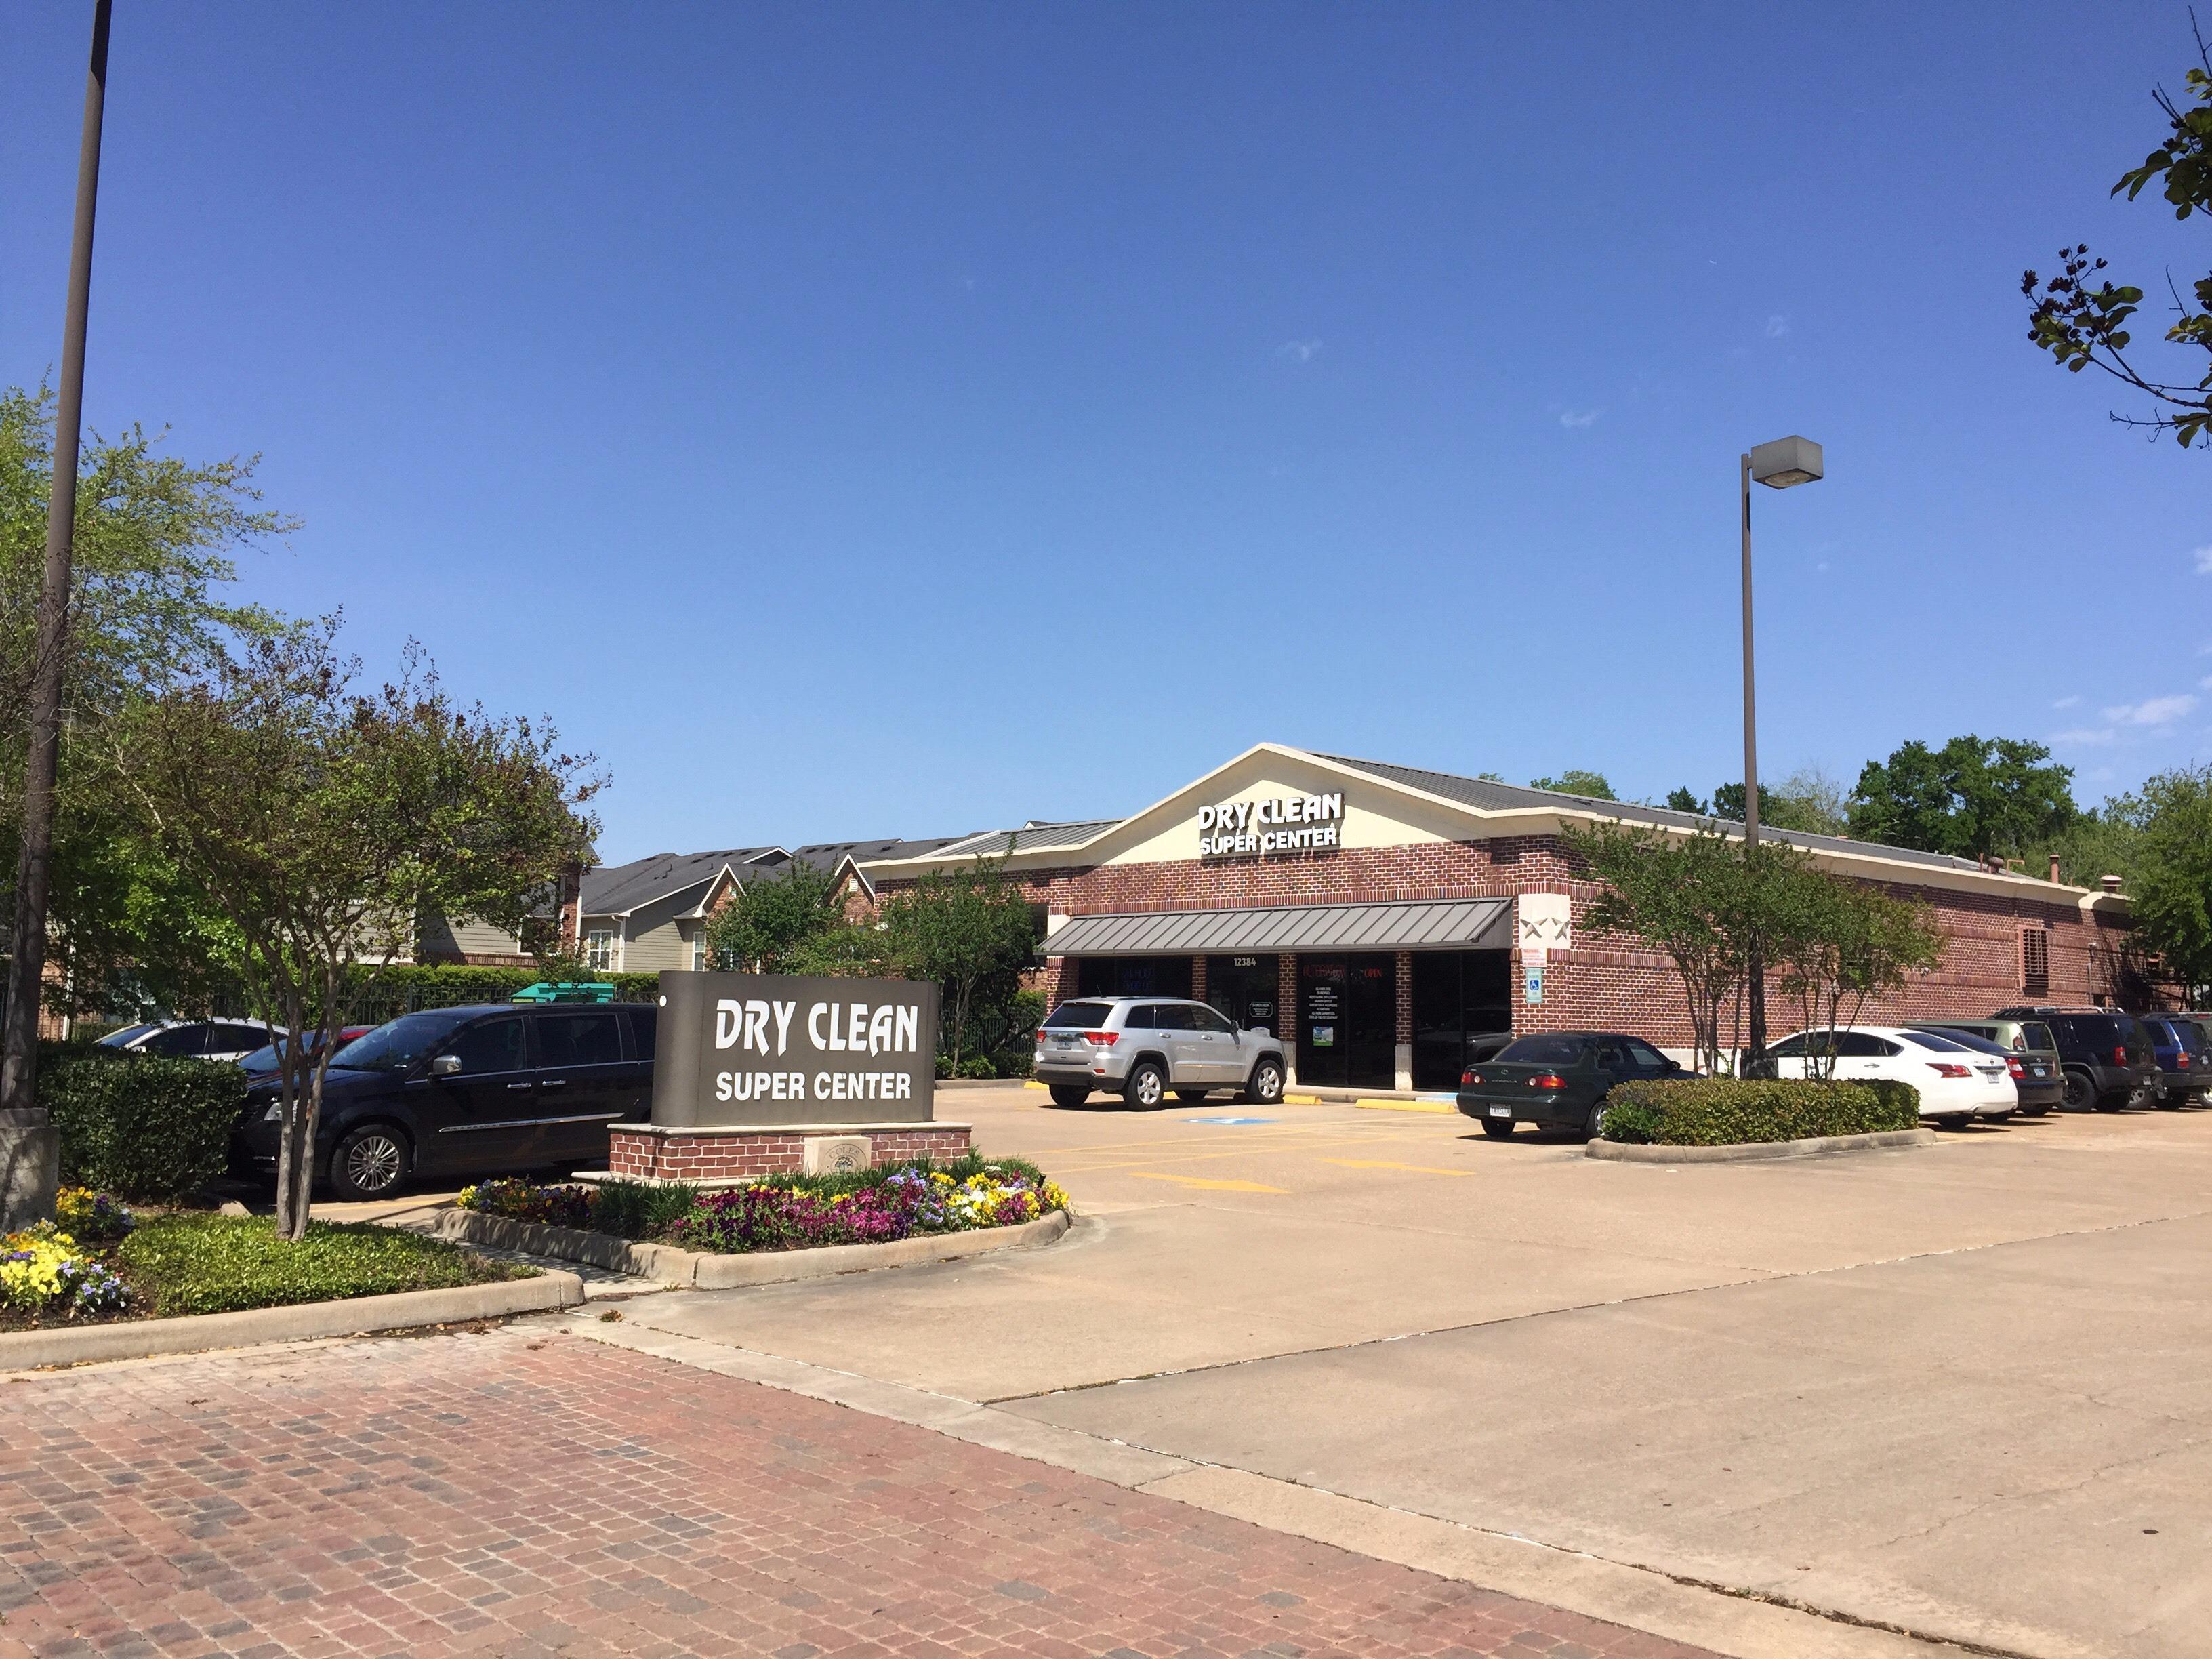 Dry Clean Super Center image 2